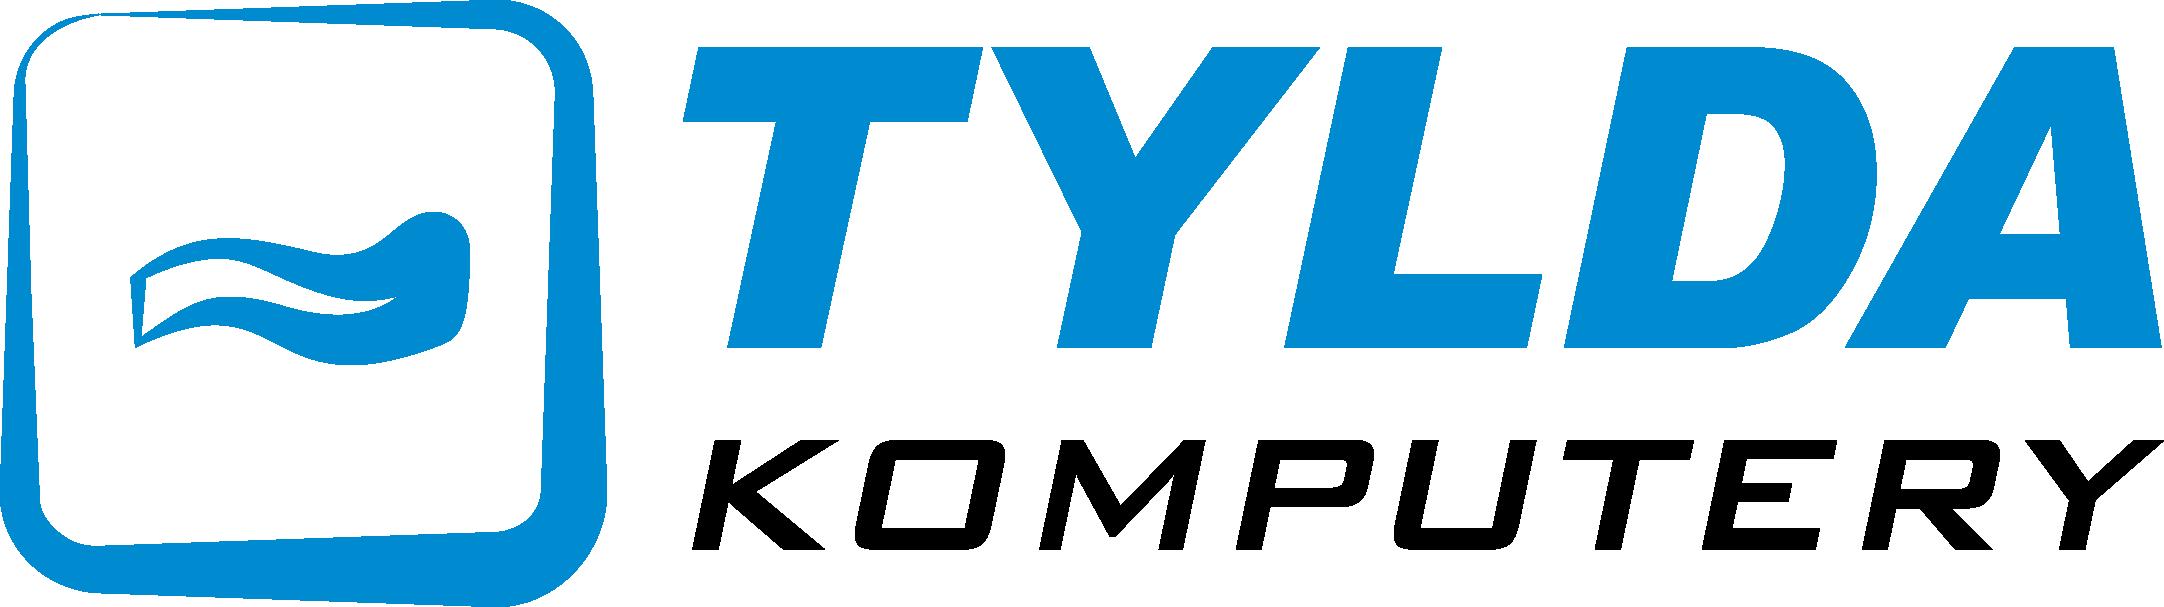 TYLDA Komputery